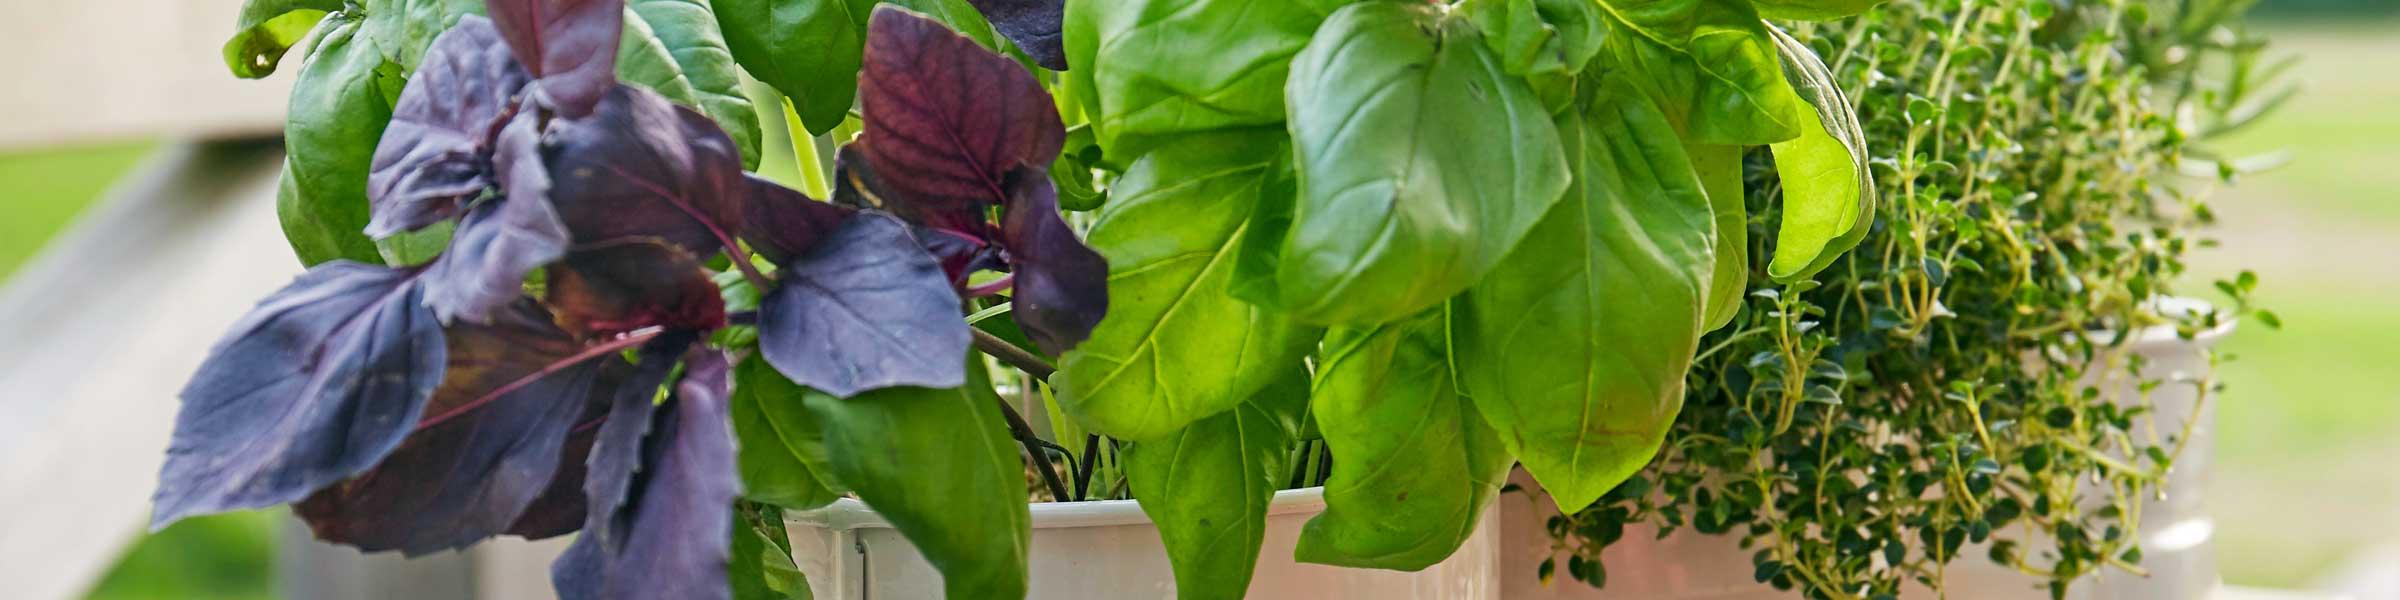 Kräuter Und Kräuterpflanzen Dehner